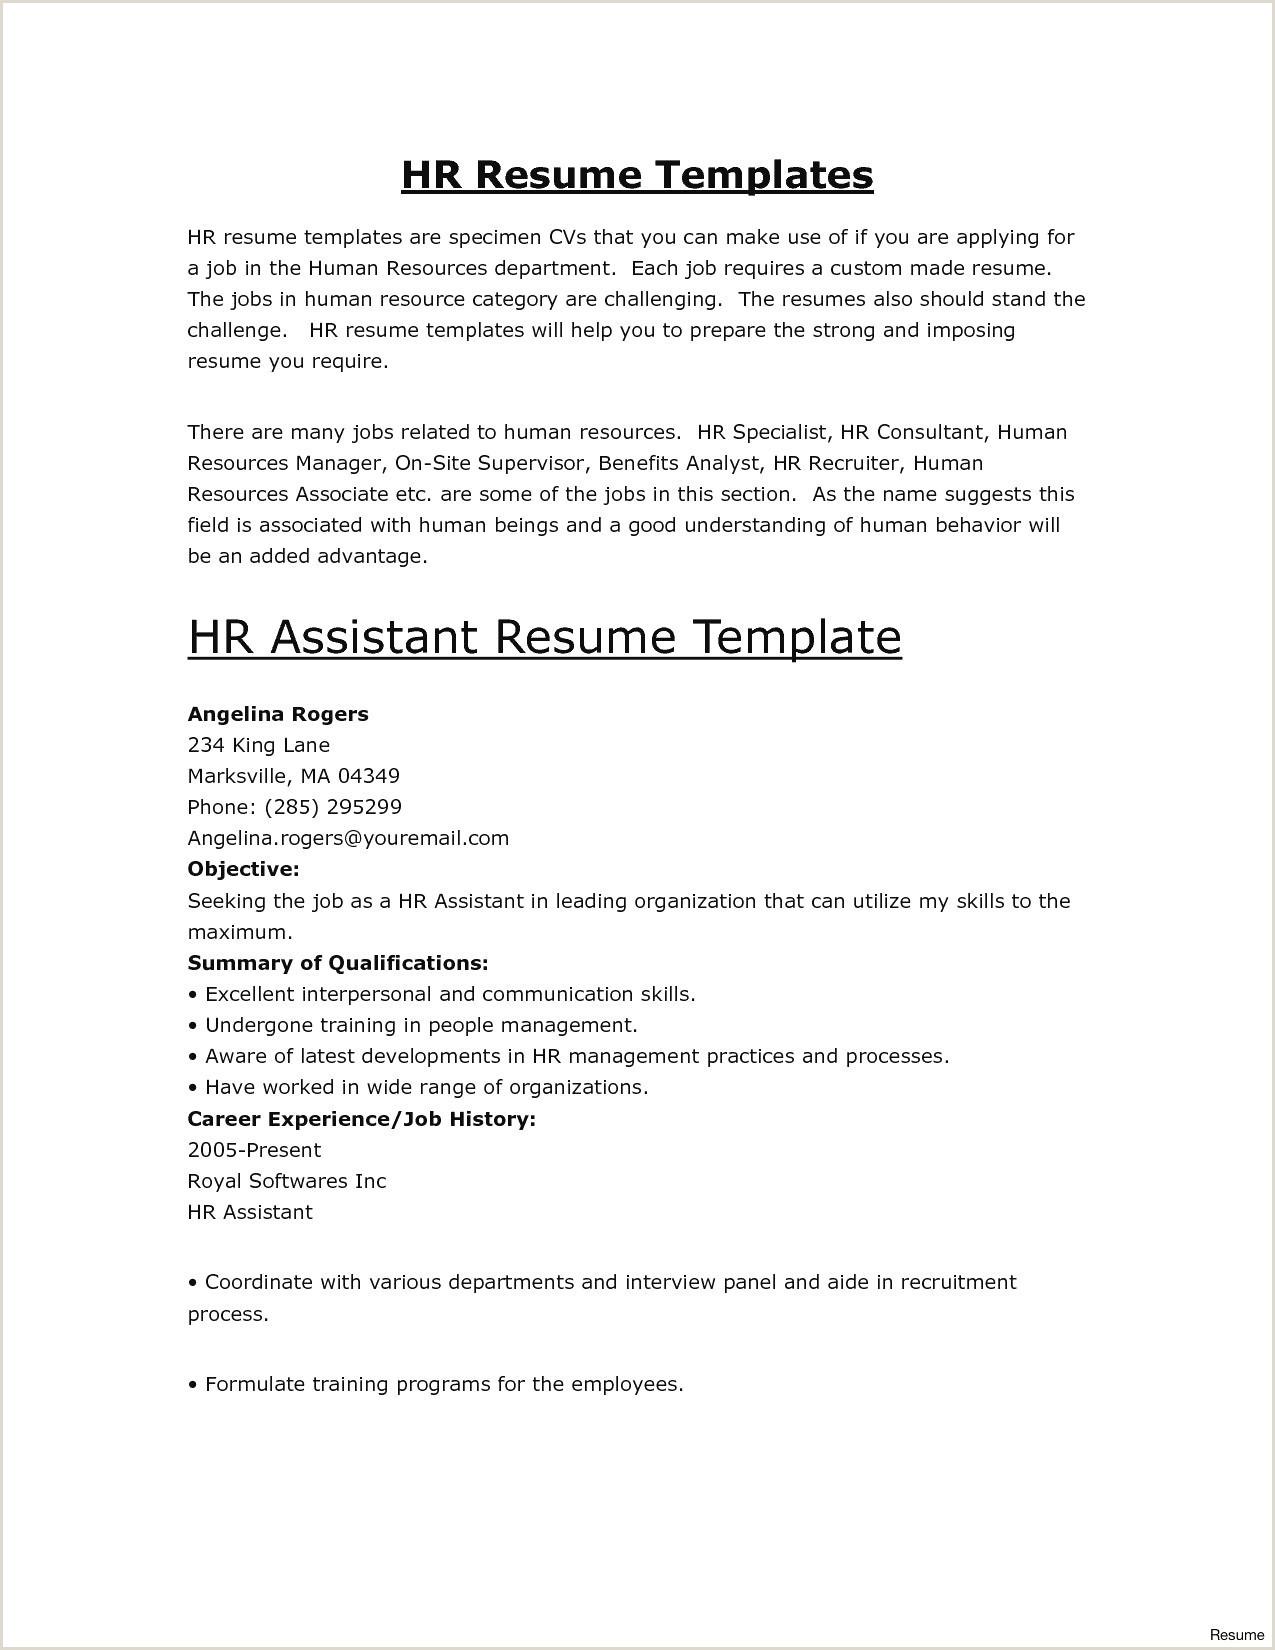 Sample Resume Malaysia Pdf New Blank Resume Template Pdf